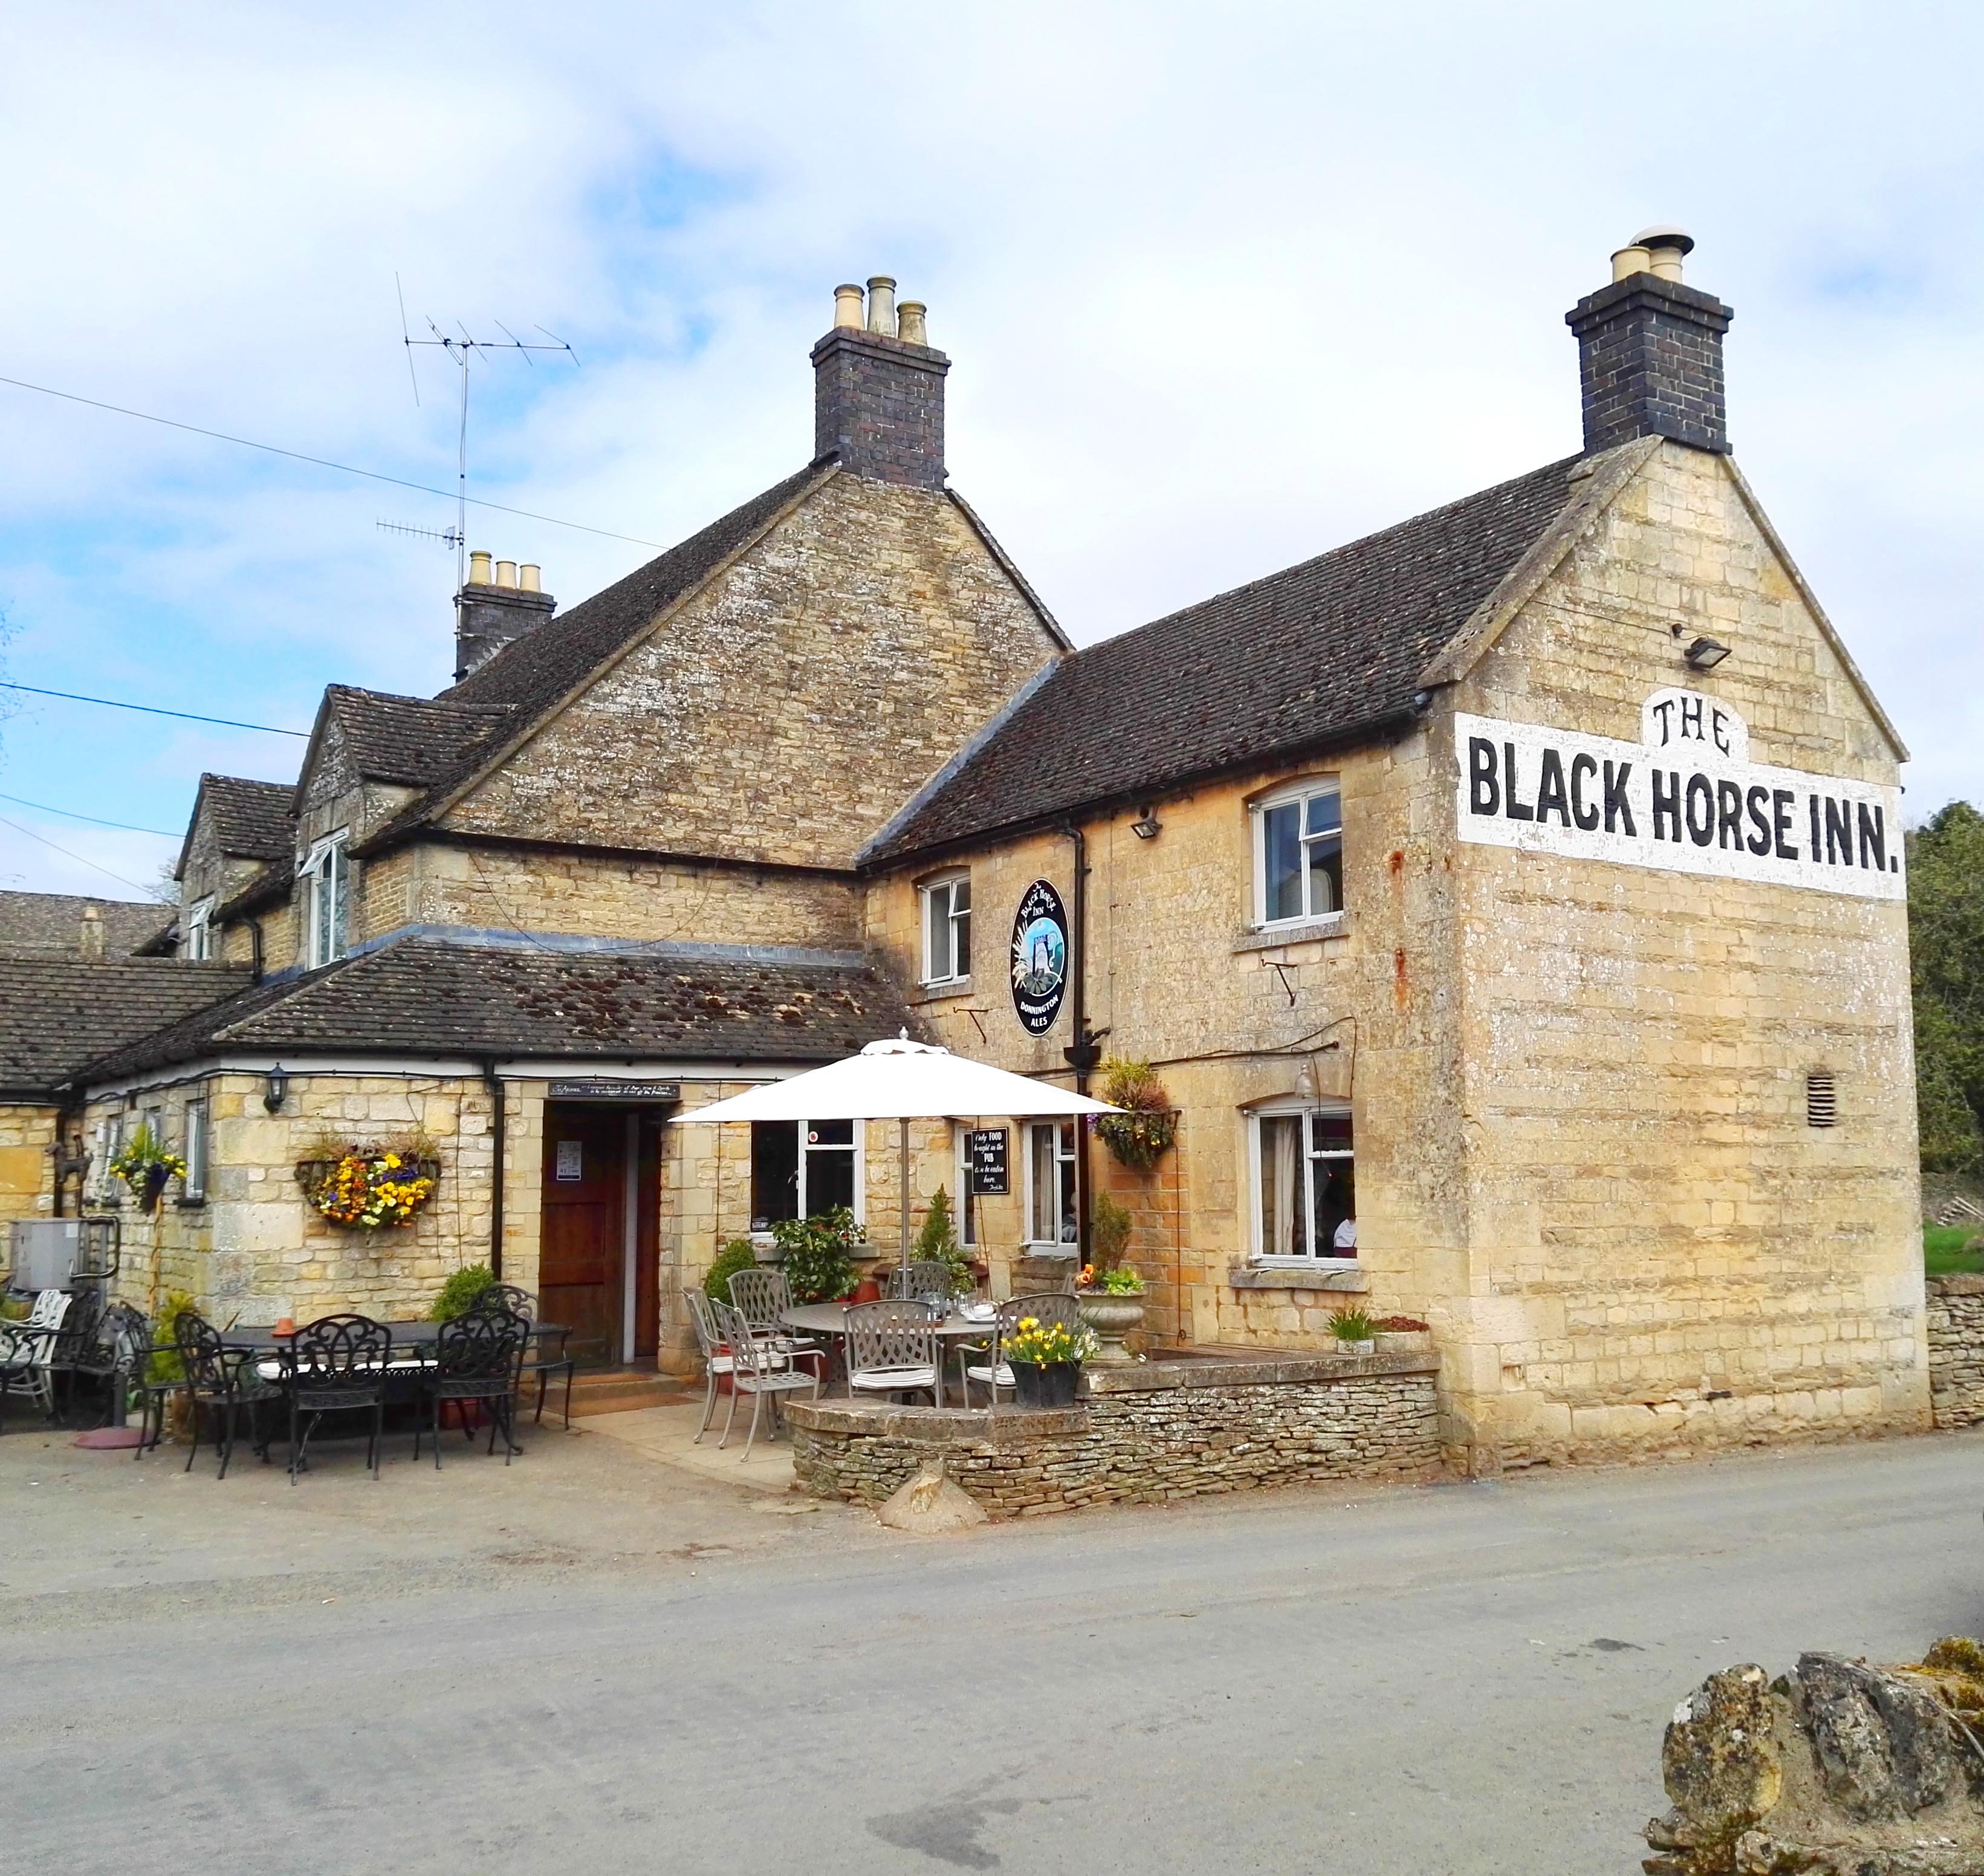 Black Horse Inn, Naunton